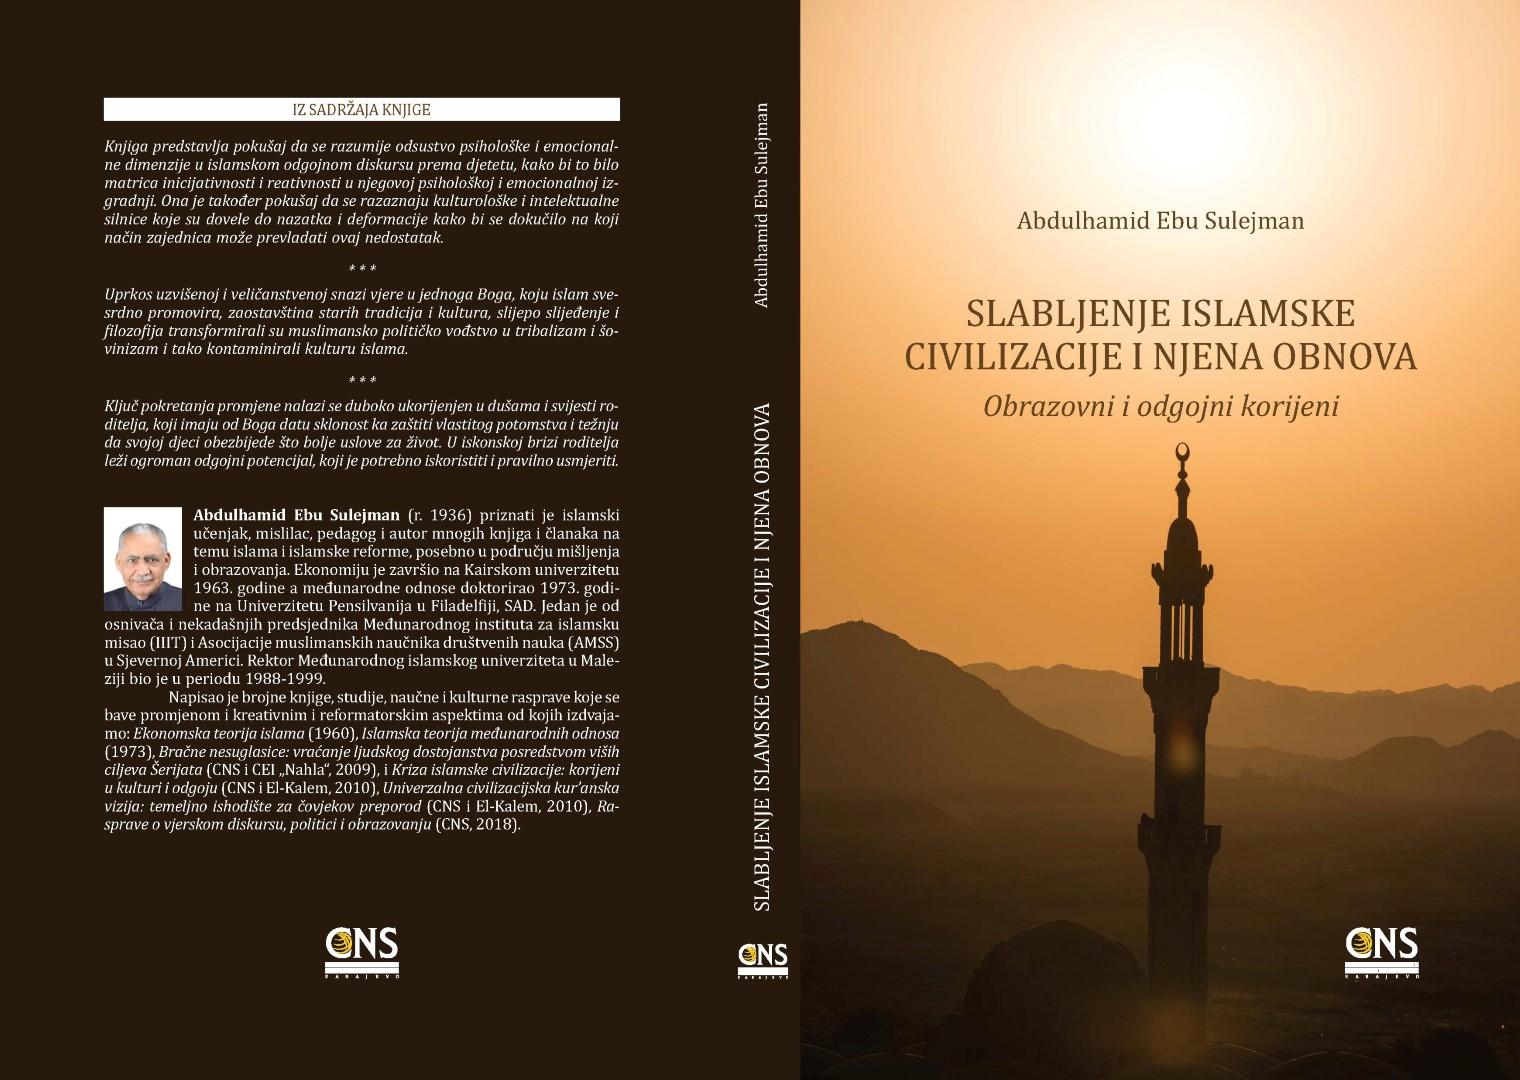 Novo izdanje: Slabljenje islamske civilizacije i njena obnova